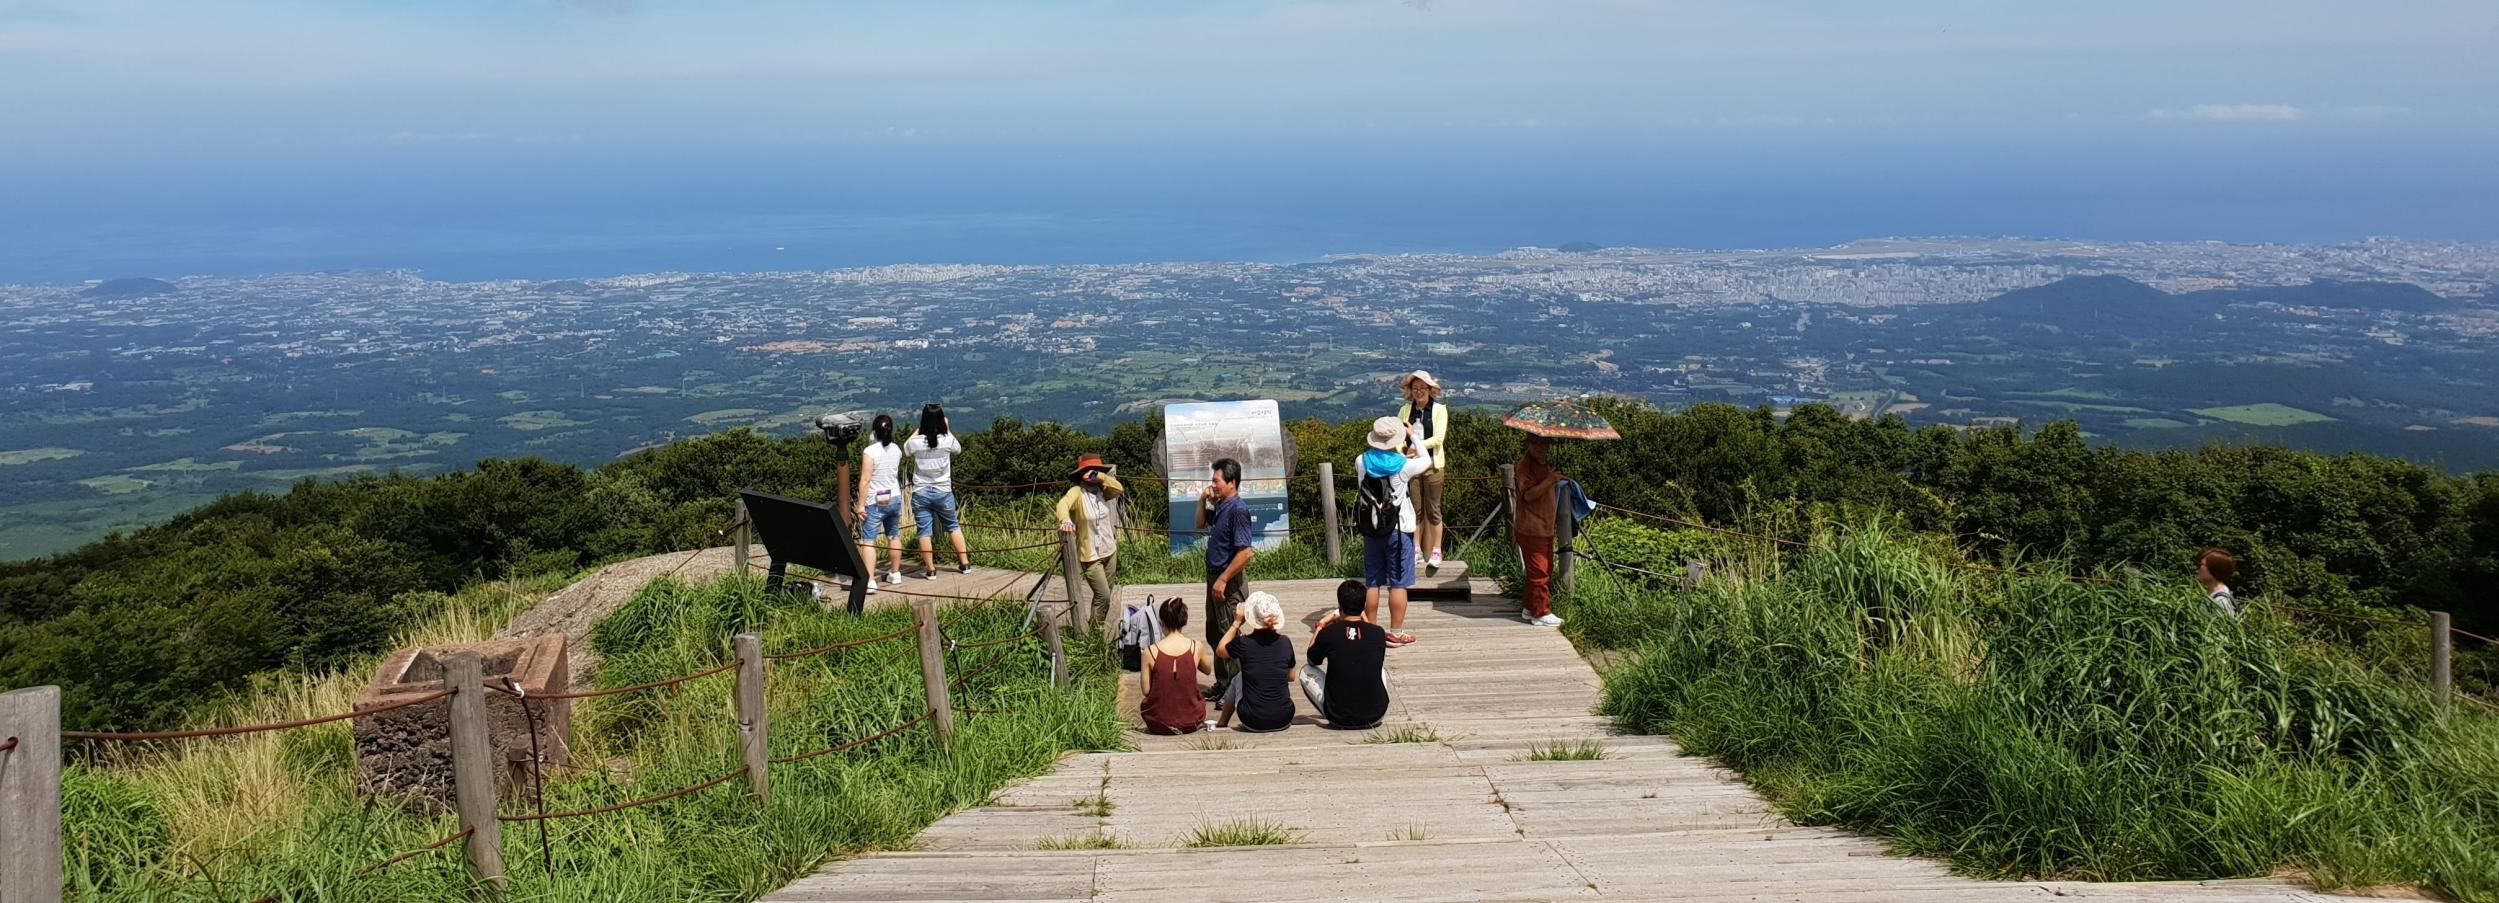 Jeju: Mt. Hallasan Small-Group Nature Hike & Lunch